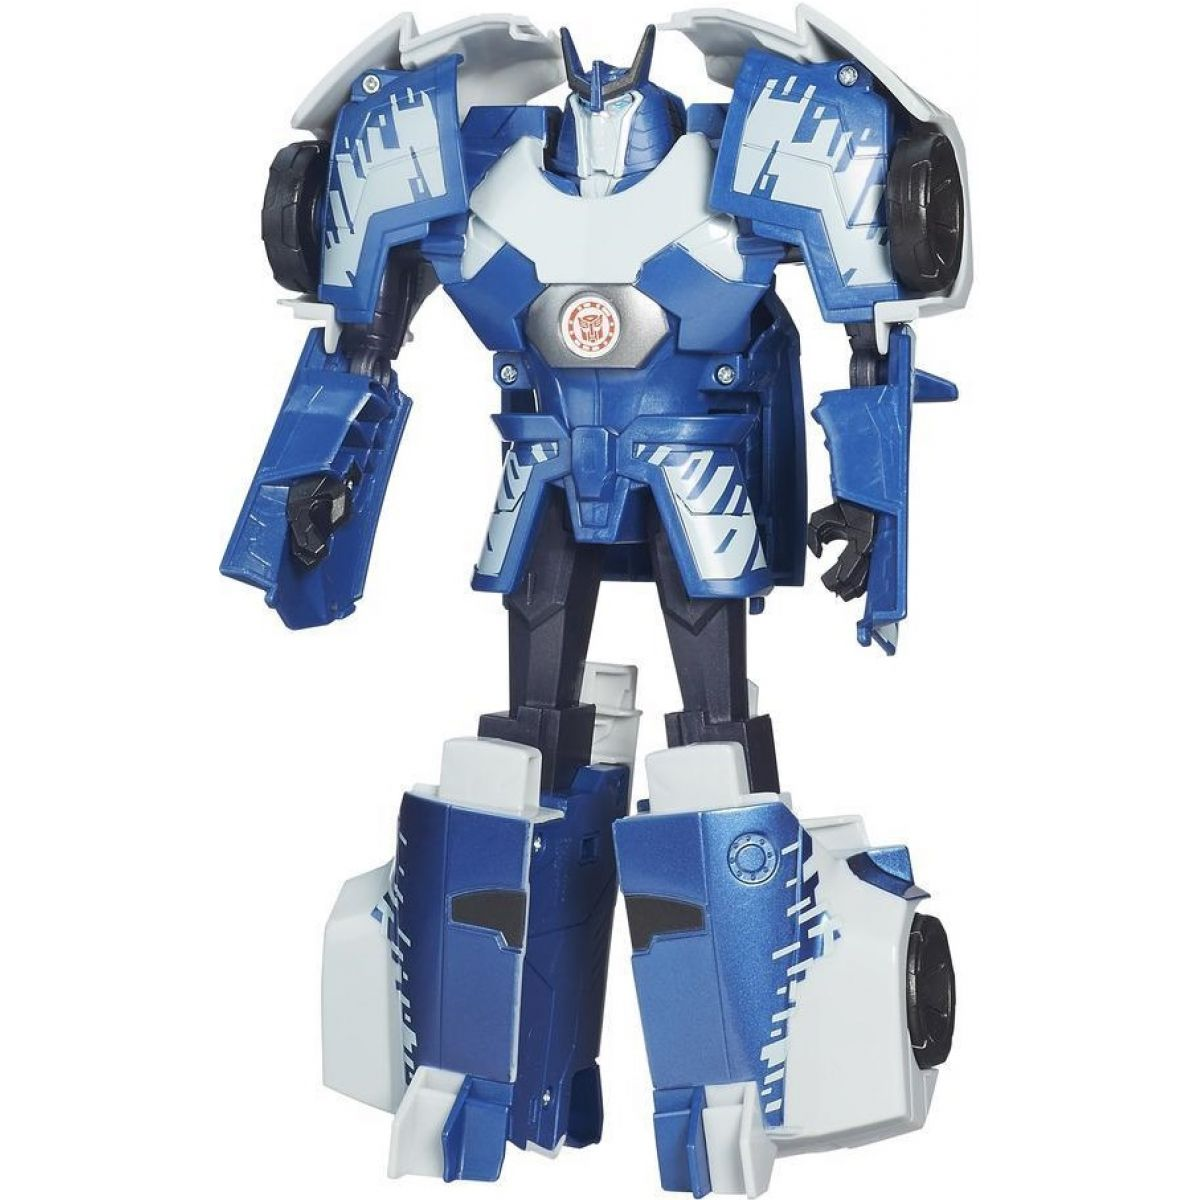 Transformers RID transformace ve 3 krocích - Autobot Drift